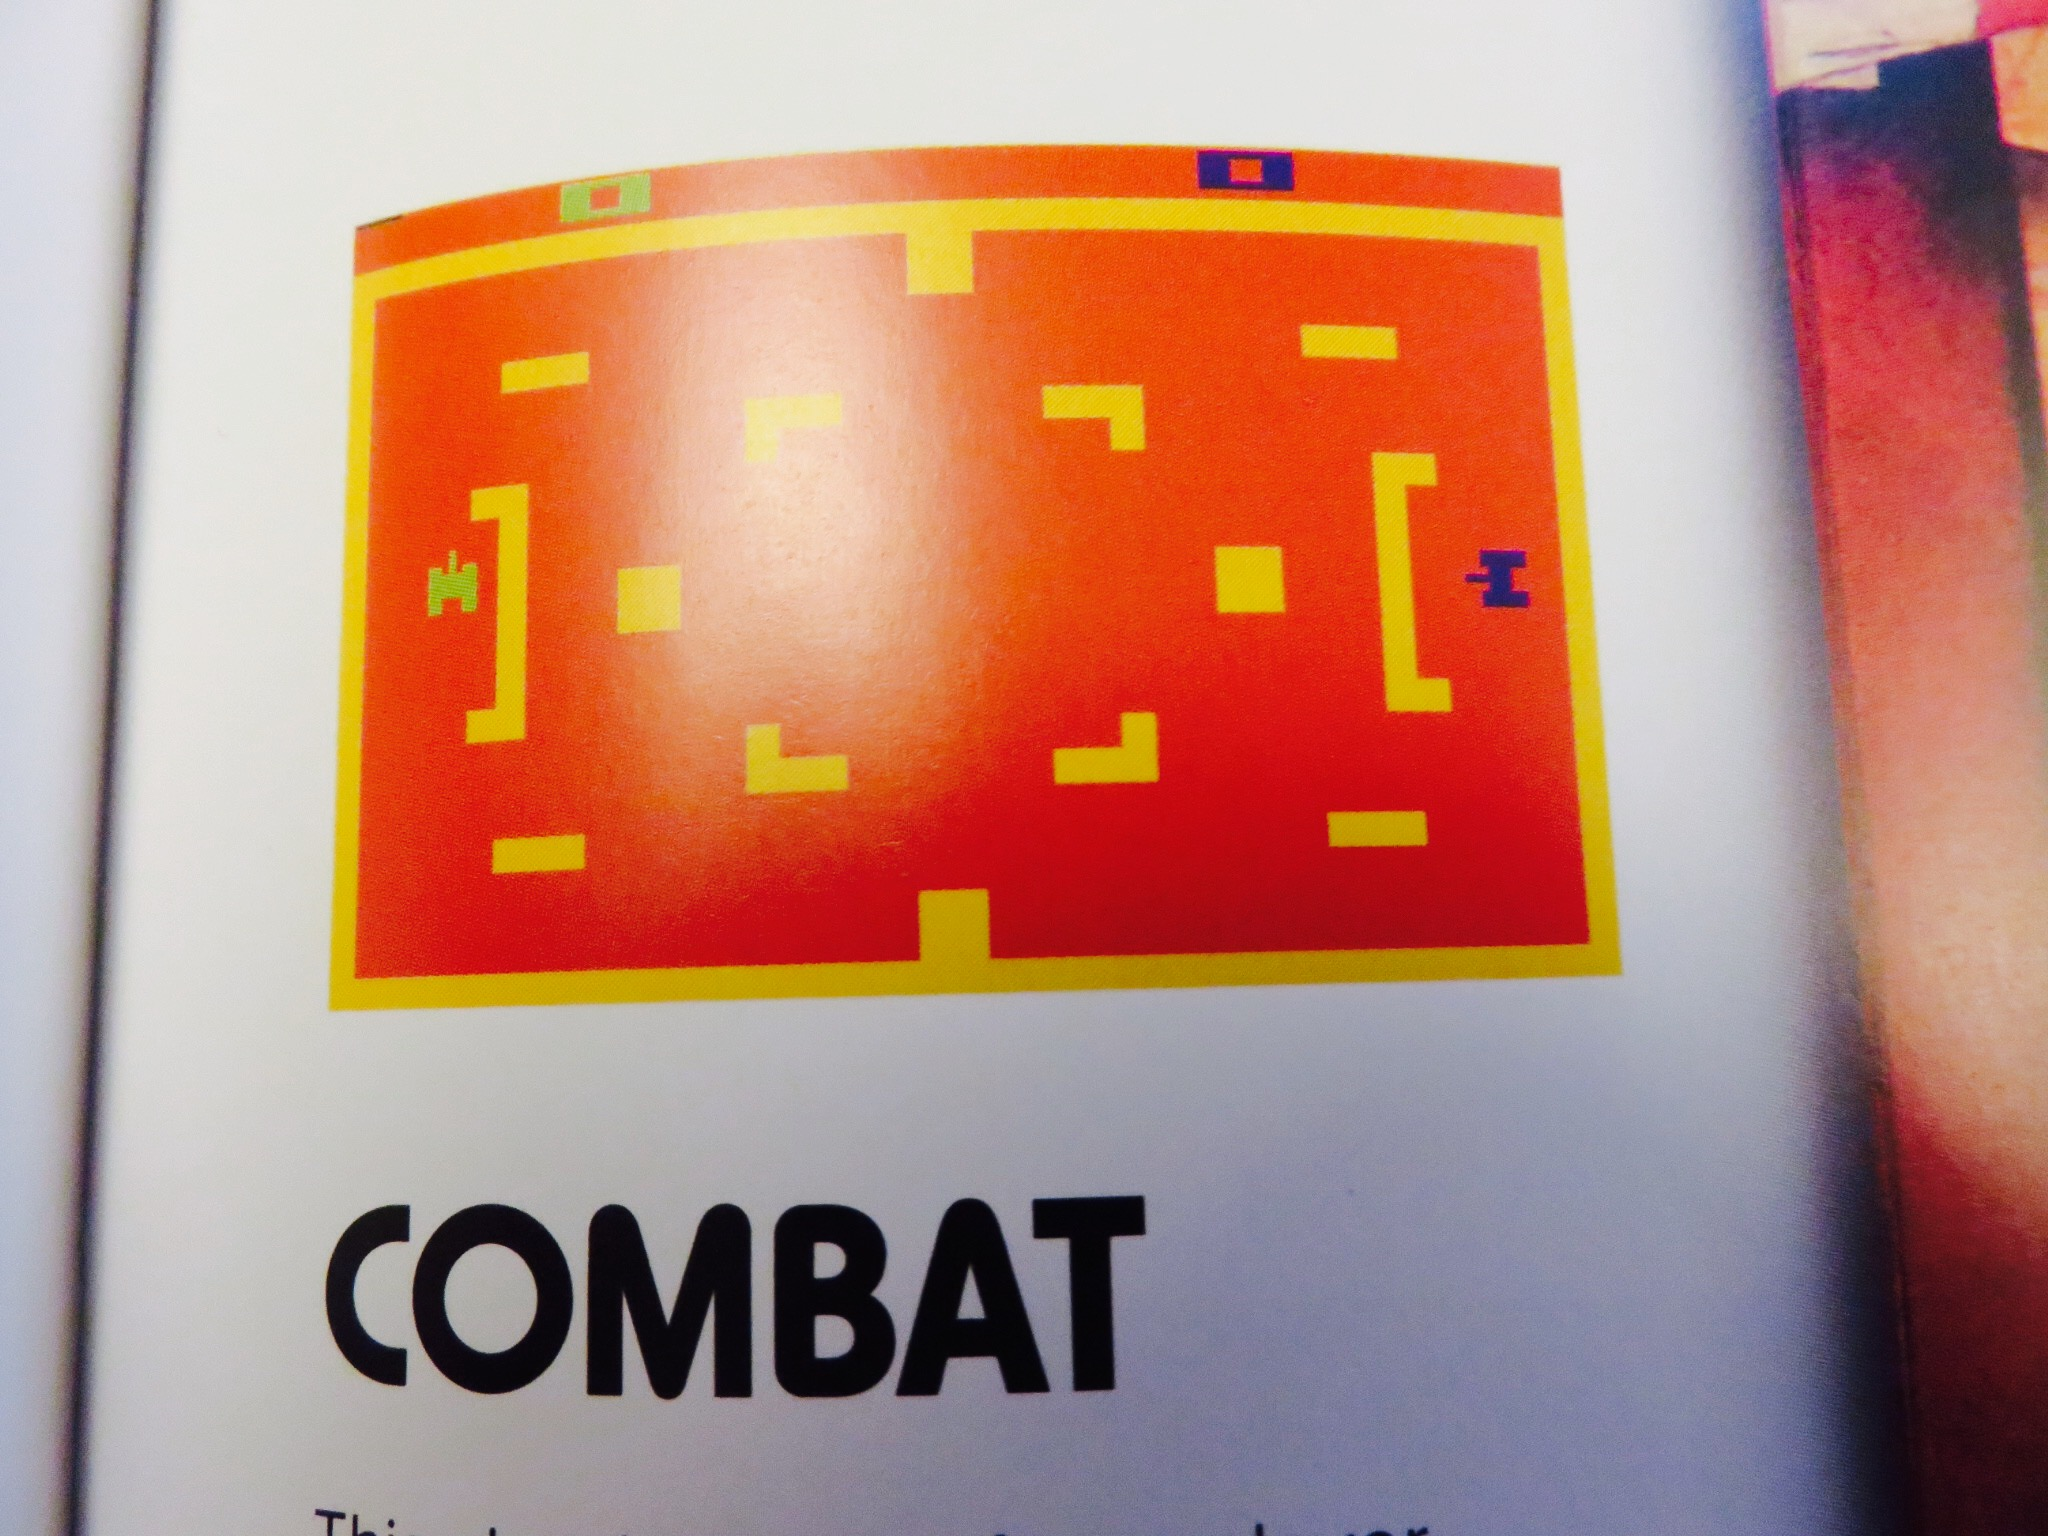 Combat gameplay screen.© The Art of Atari